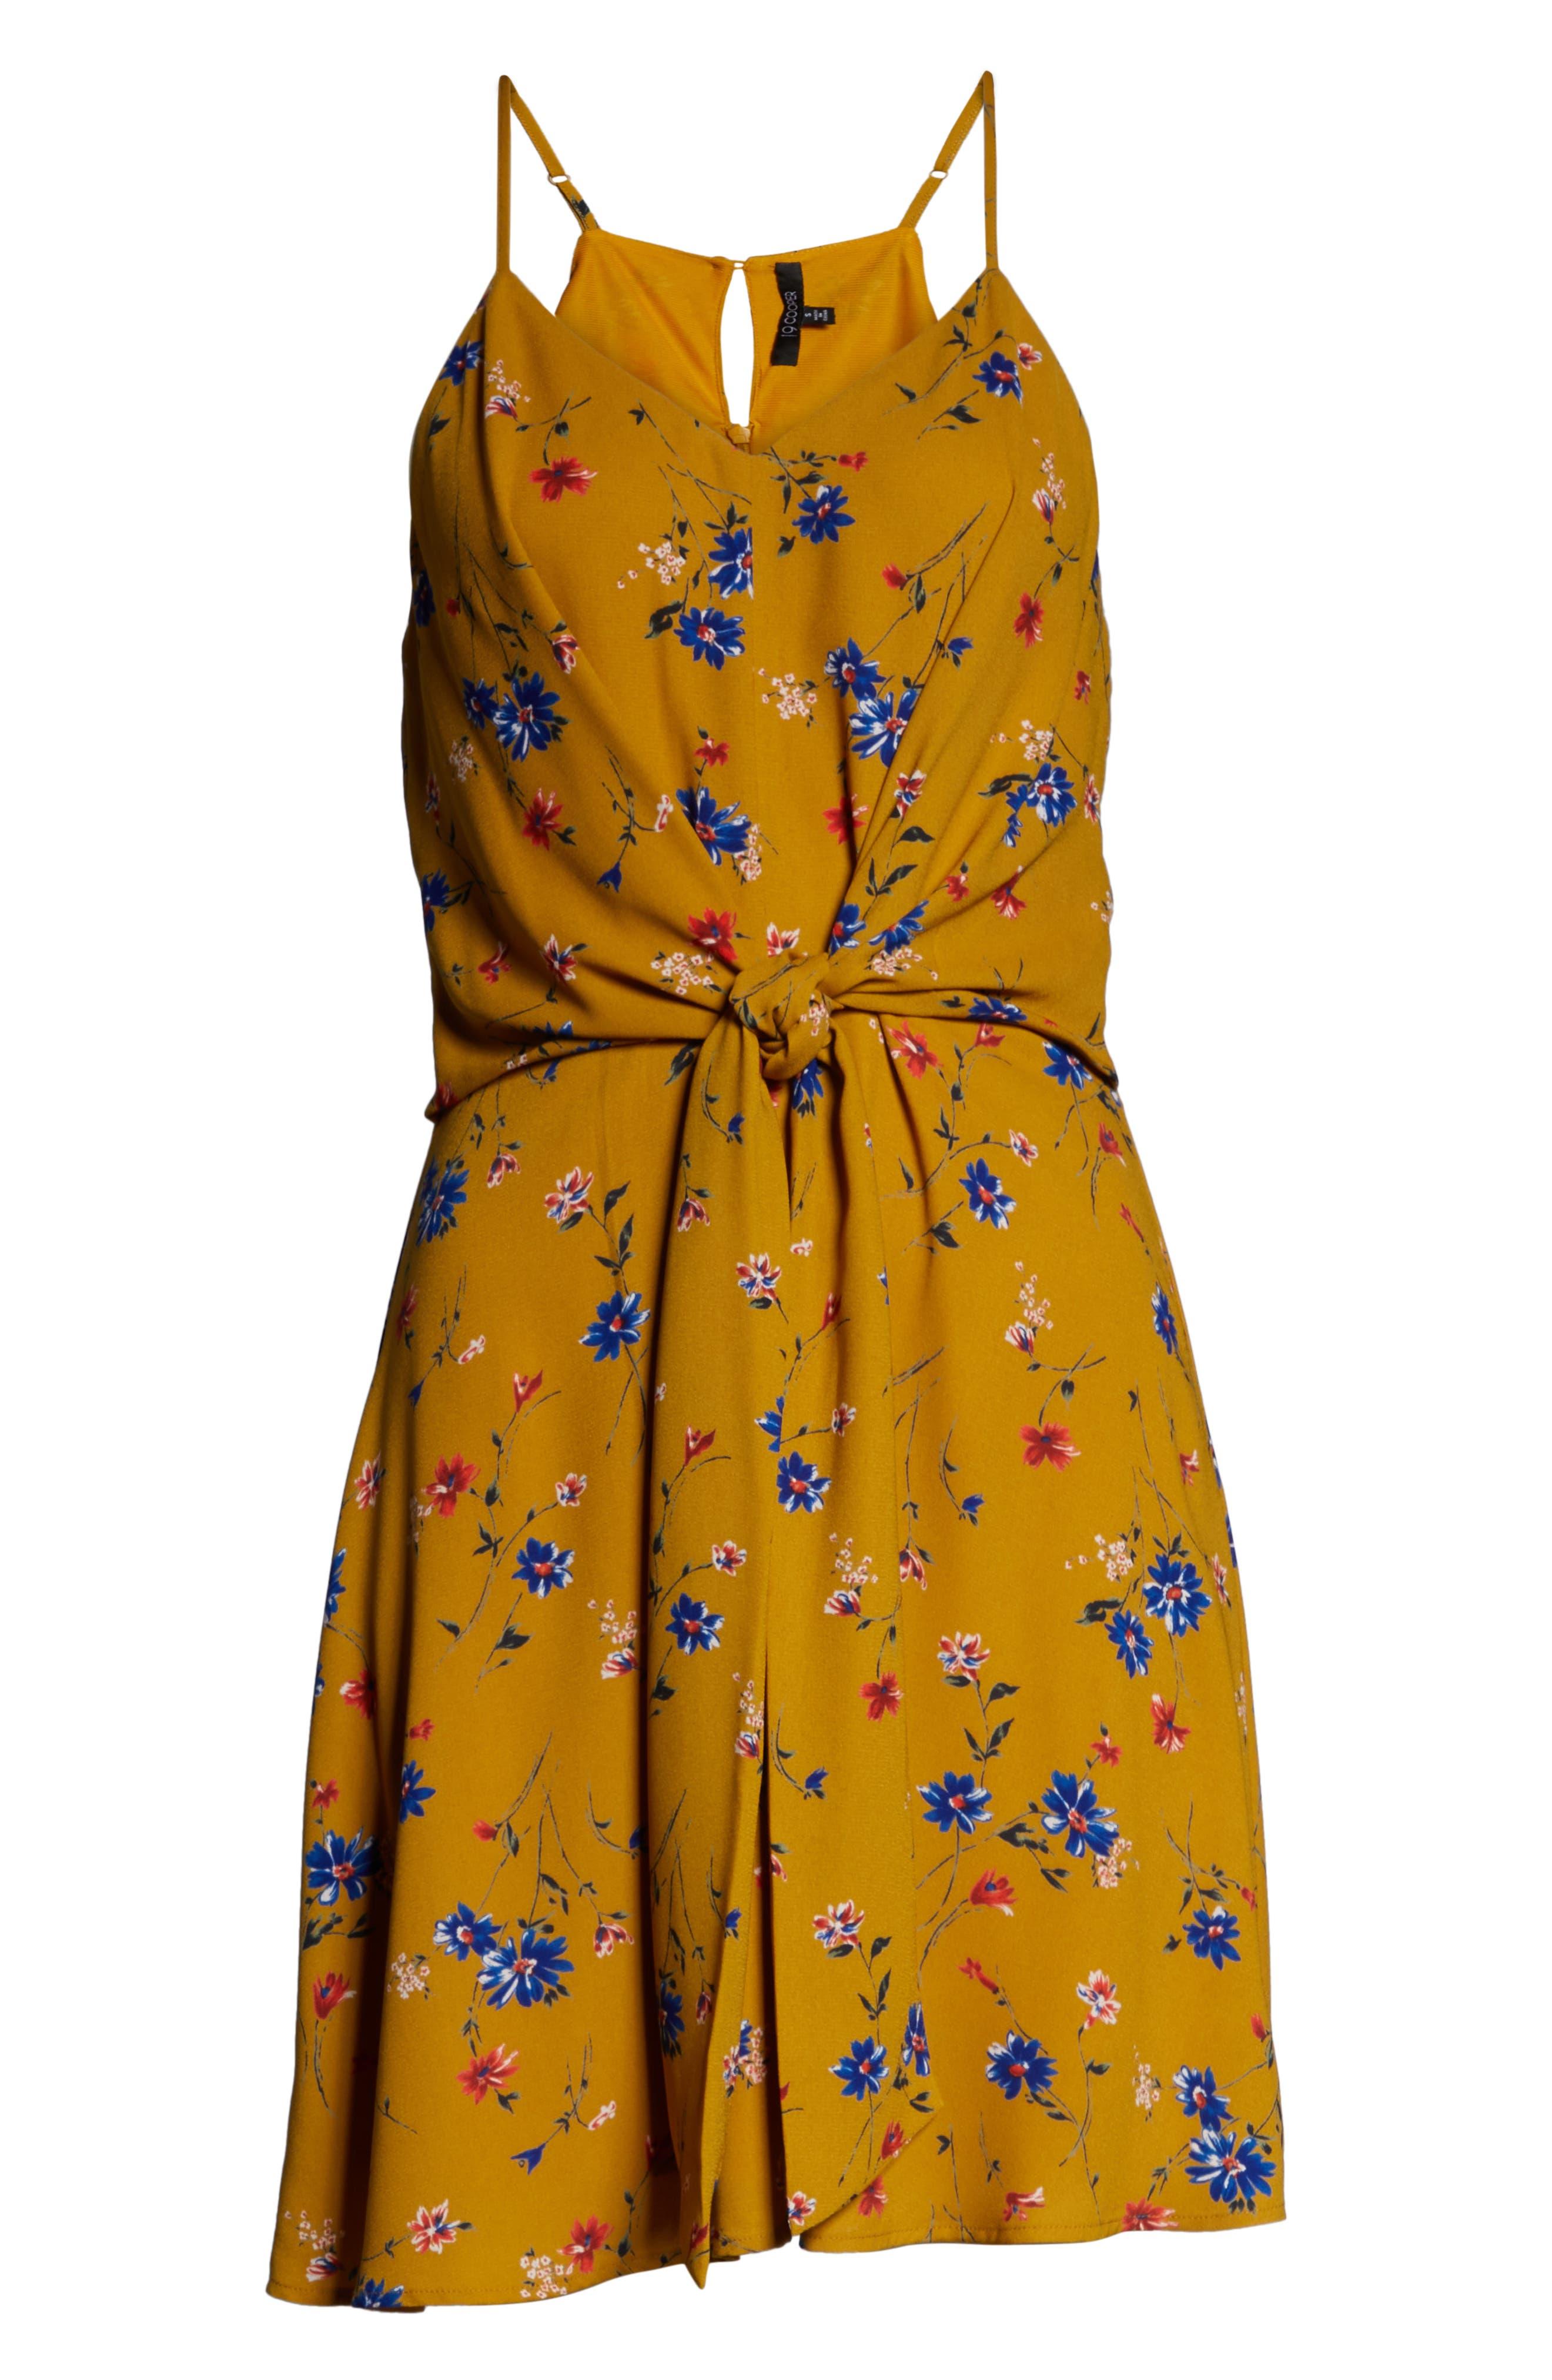 19 COOPER, Floral Print Tie Front Dress, Alternate thumbnail 7, color, MUSTARD FLORAL